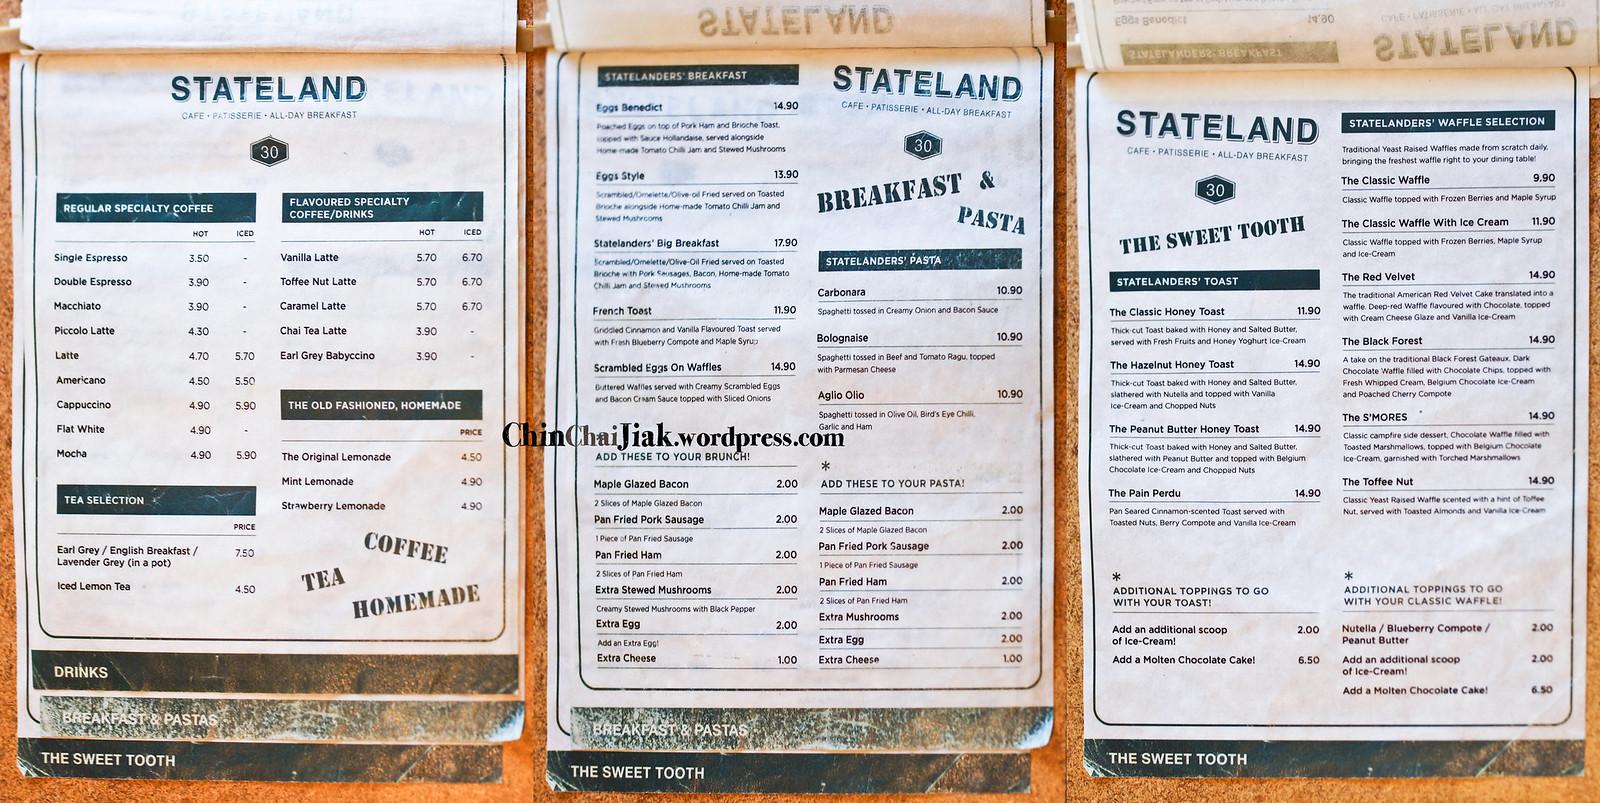 Stateland Cafe at Bali Lane (Bugis) | Chin Chai Jiak